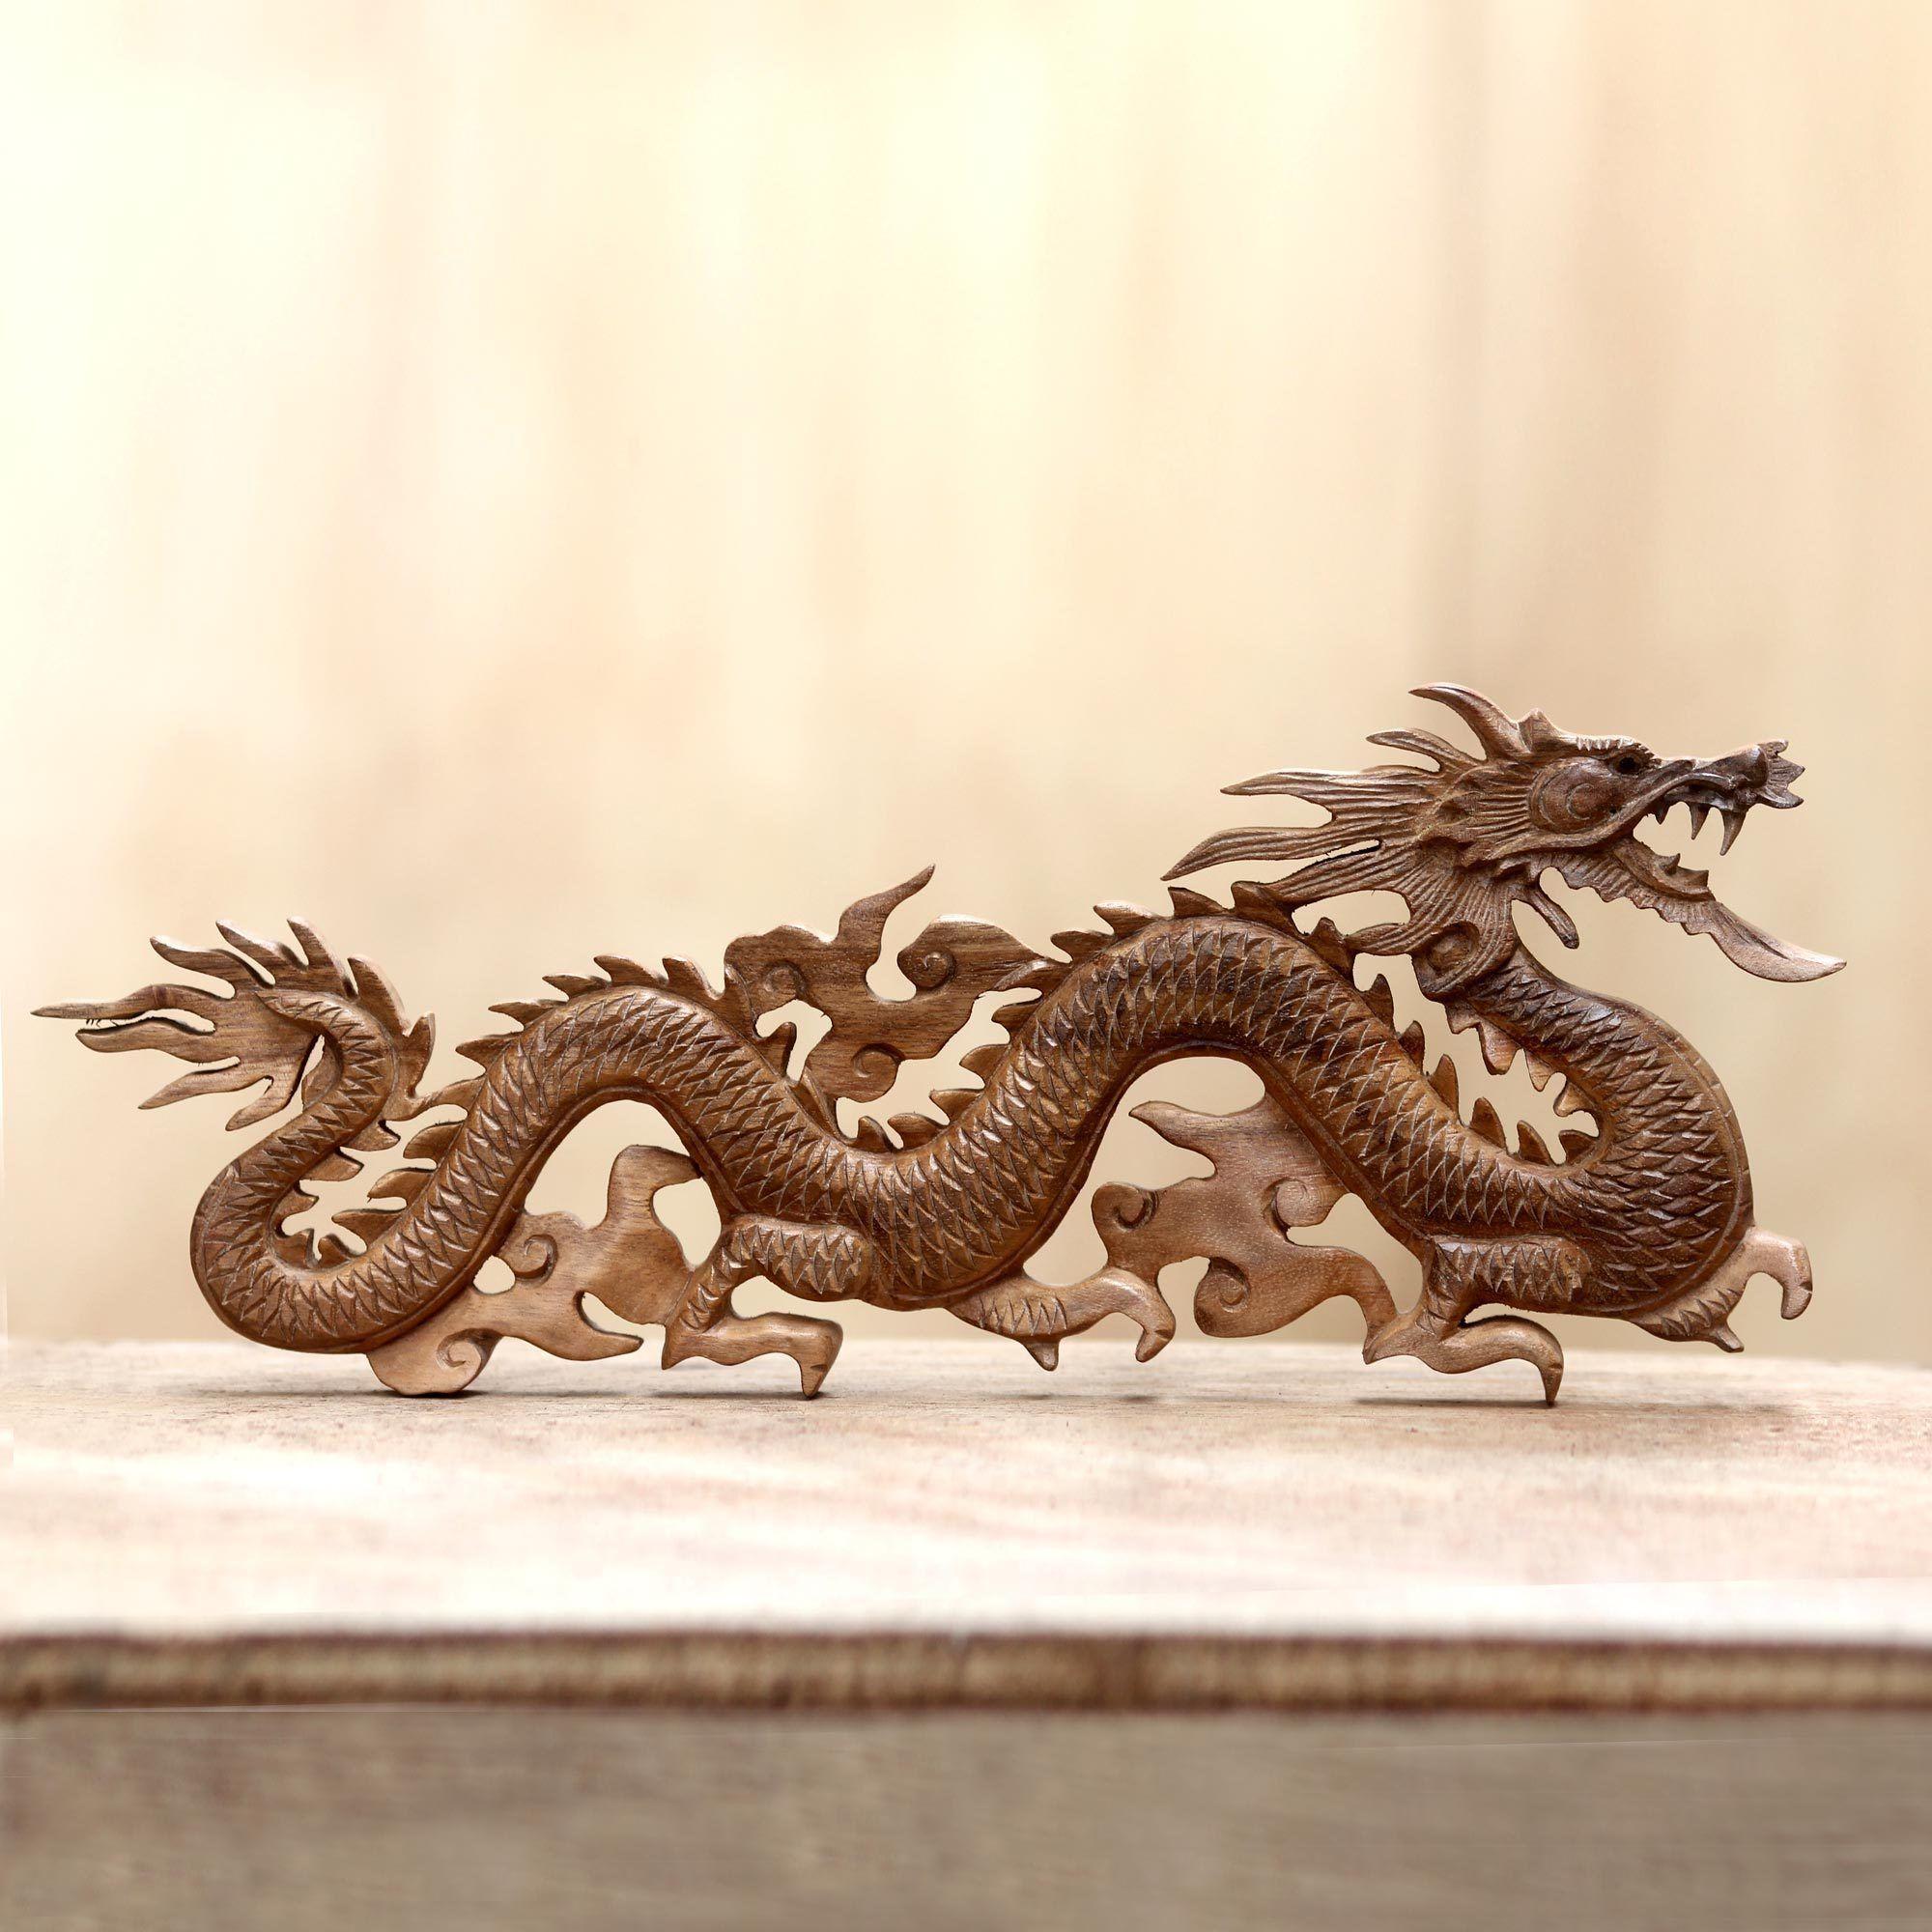 Novica baru klinthing dragon traditional artisan handmade hand